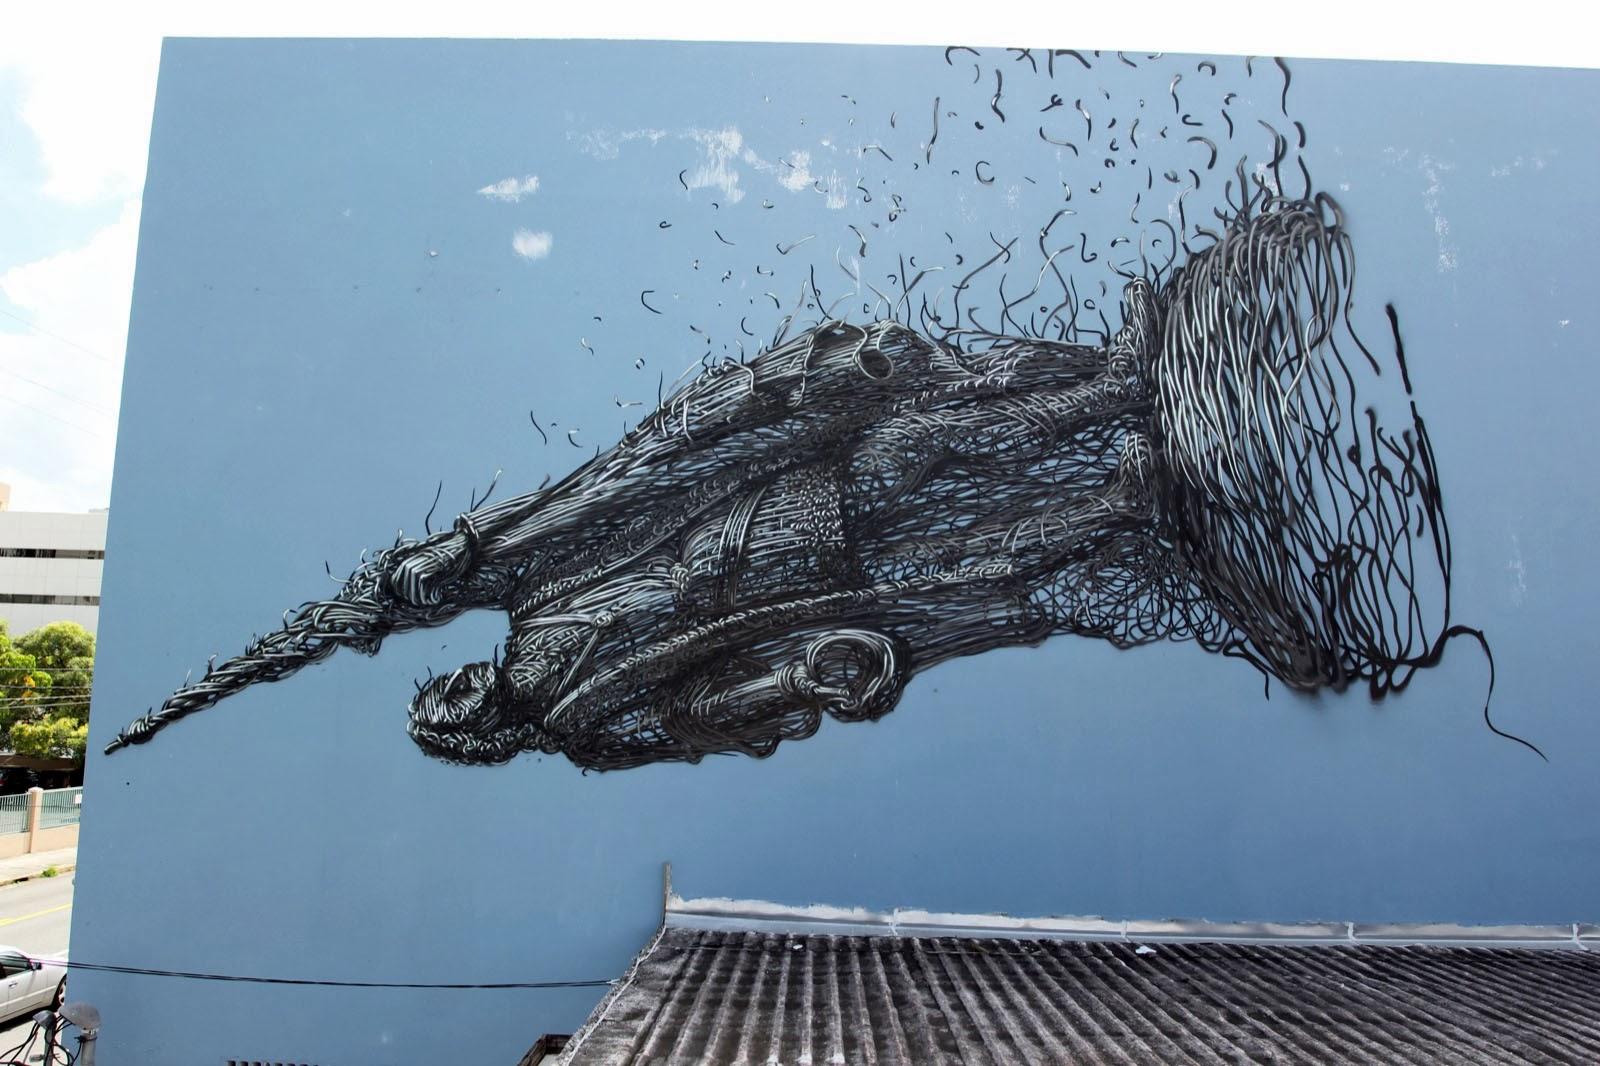 daleast-new-mural-at-los-muros-hablan-festival-01